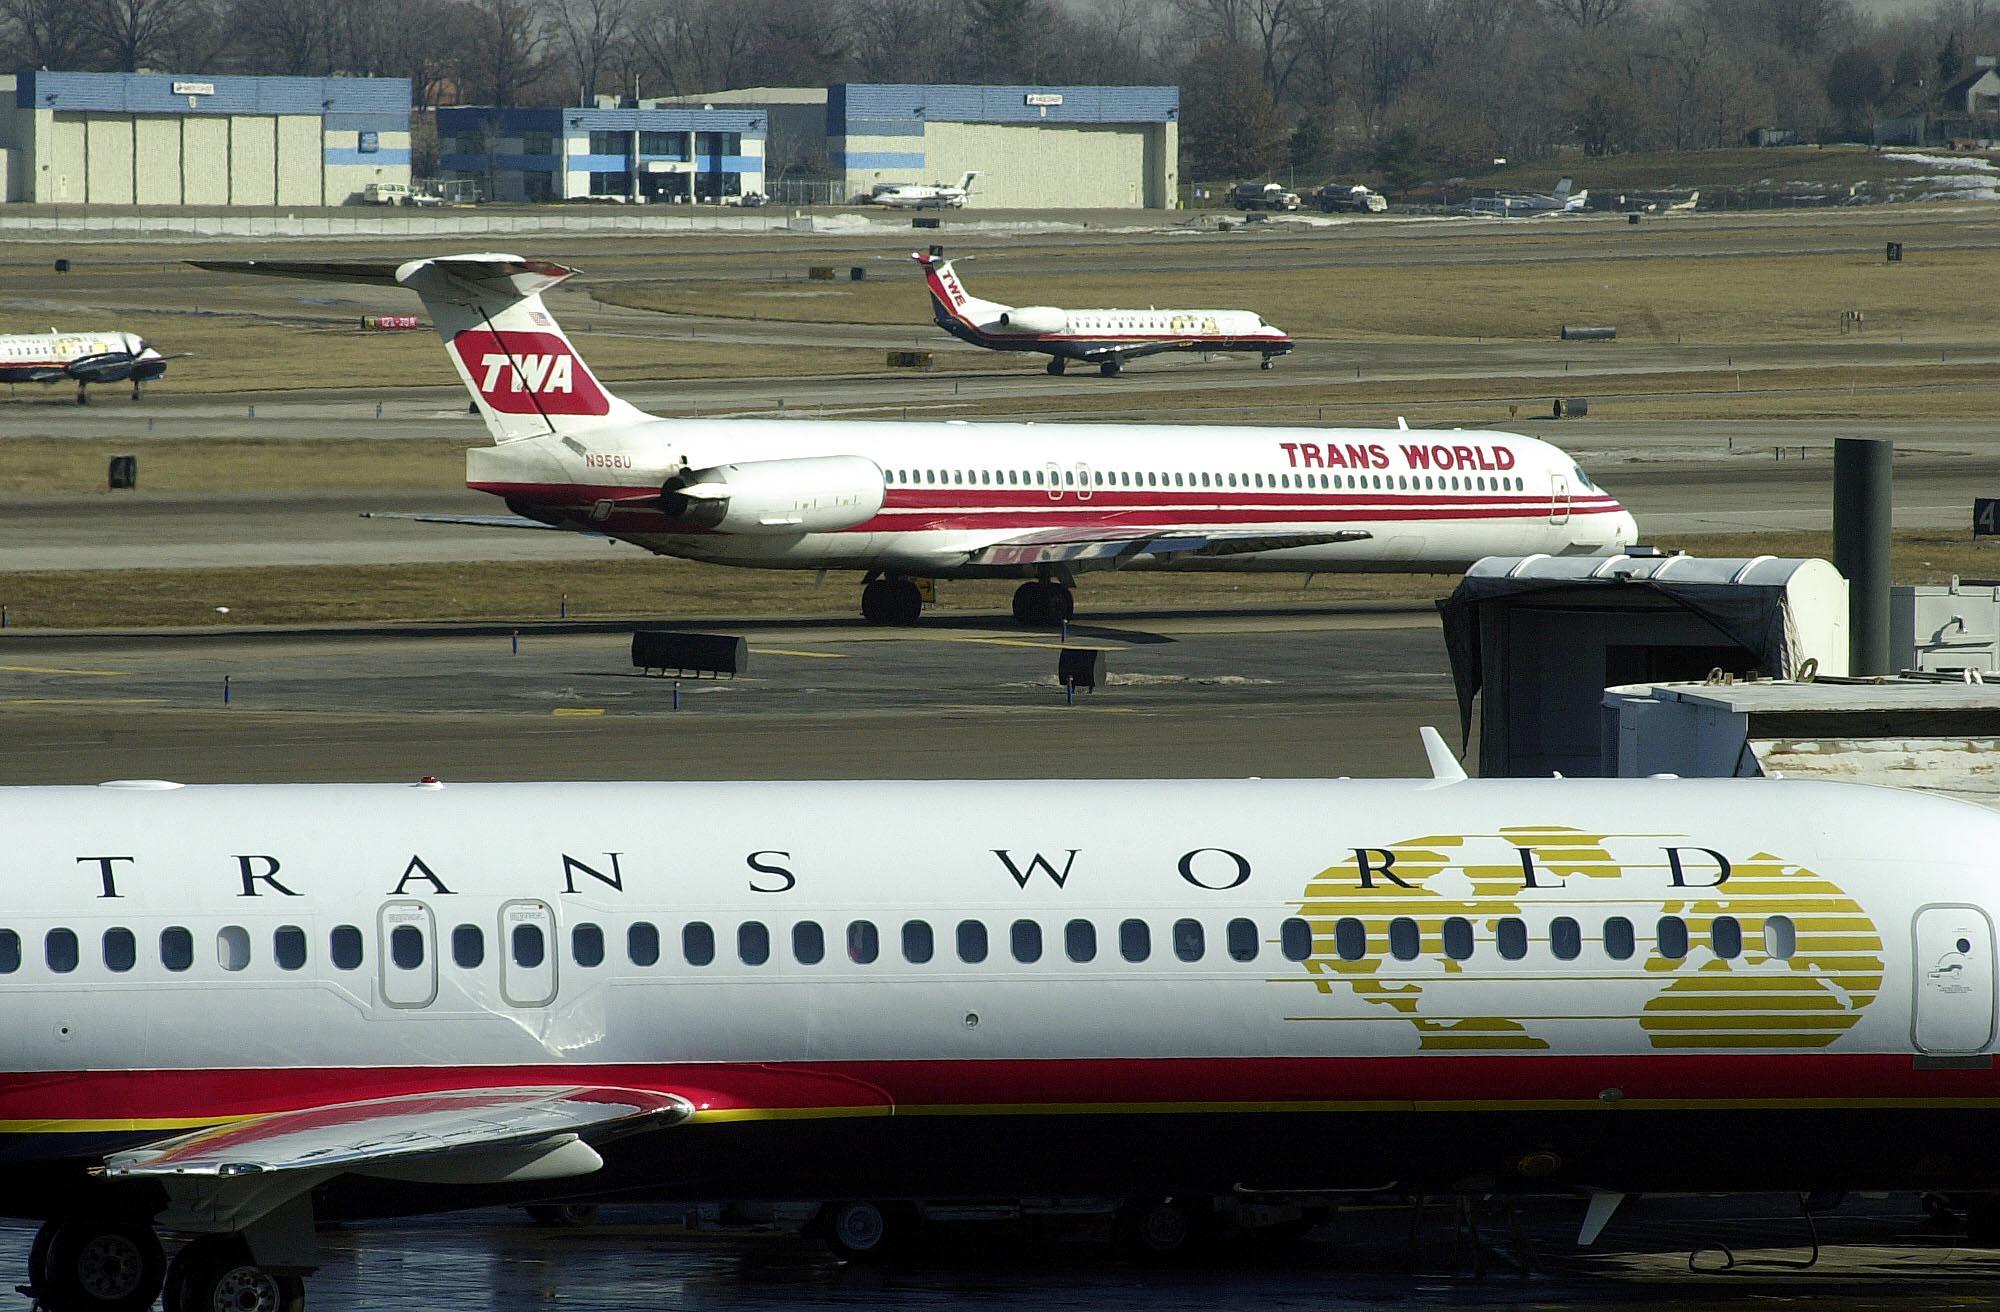 Trans World Airlines aircraft are seen at St. Louis-Lambert International Airport. (Photo by Bill Greenblatt/Liaison)